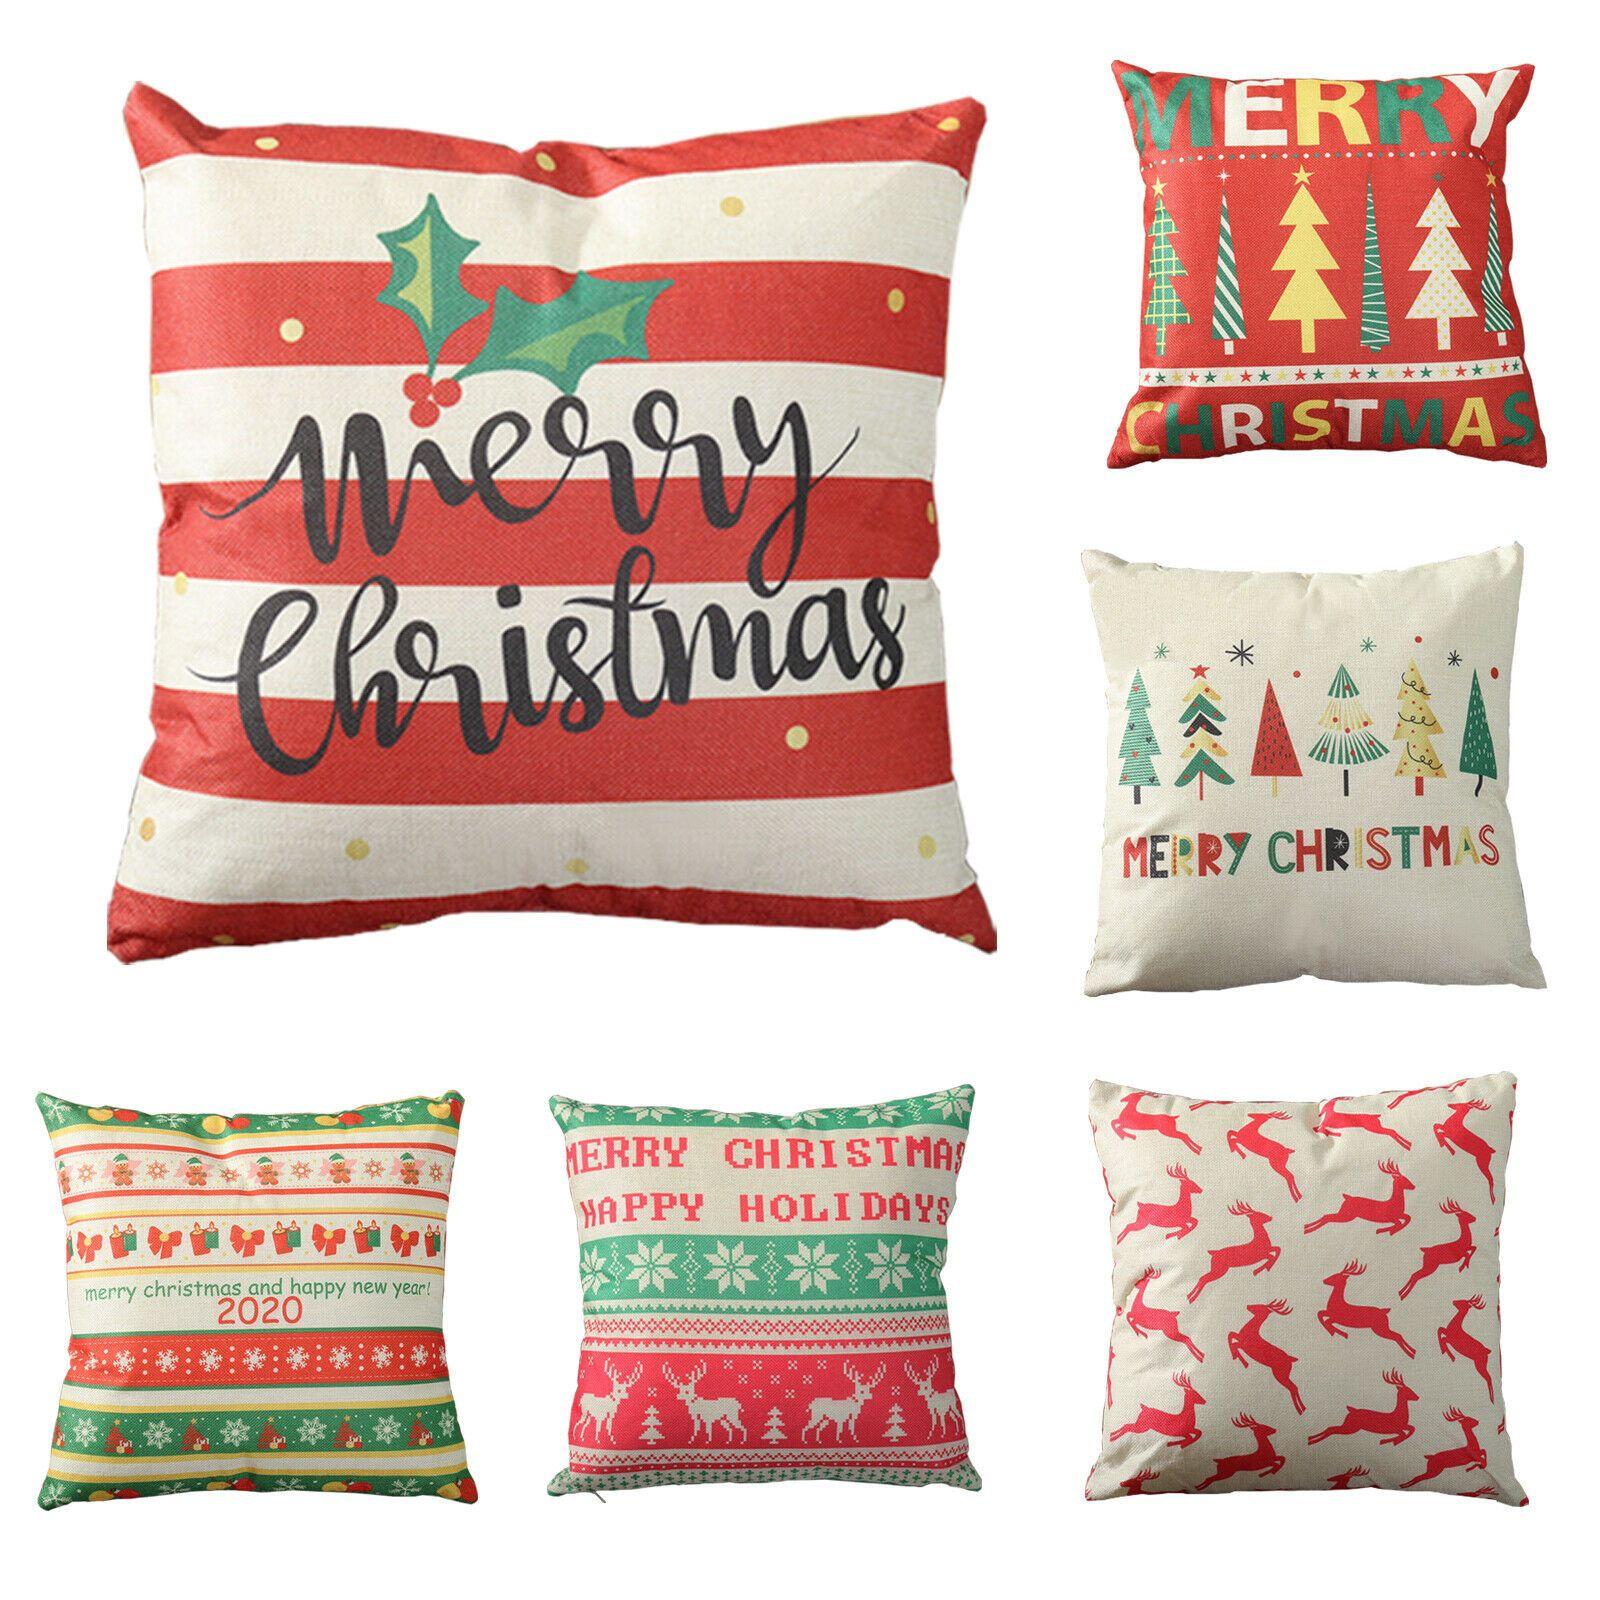 New Christmas Pillow Cotton Linen Sofa Throw Cushion Case Cover Home Decor Sales Sofa Cushions Idea With Images Throw Cushion Covers Christmas Pillow Cotton Linen Sofa